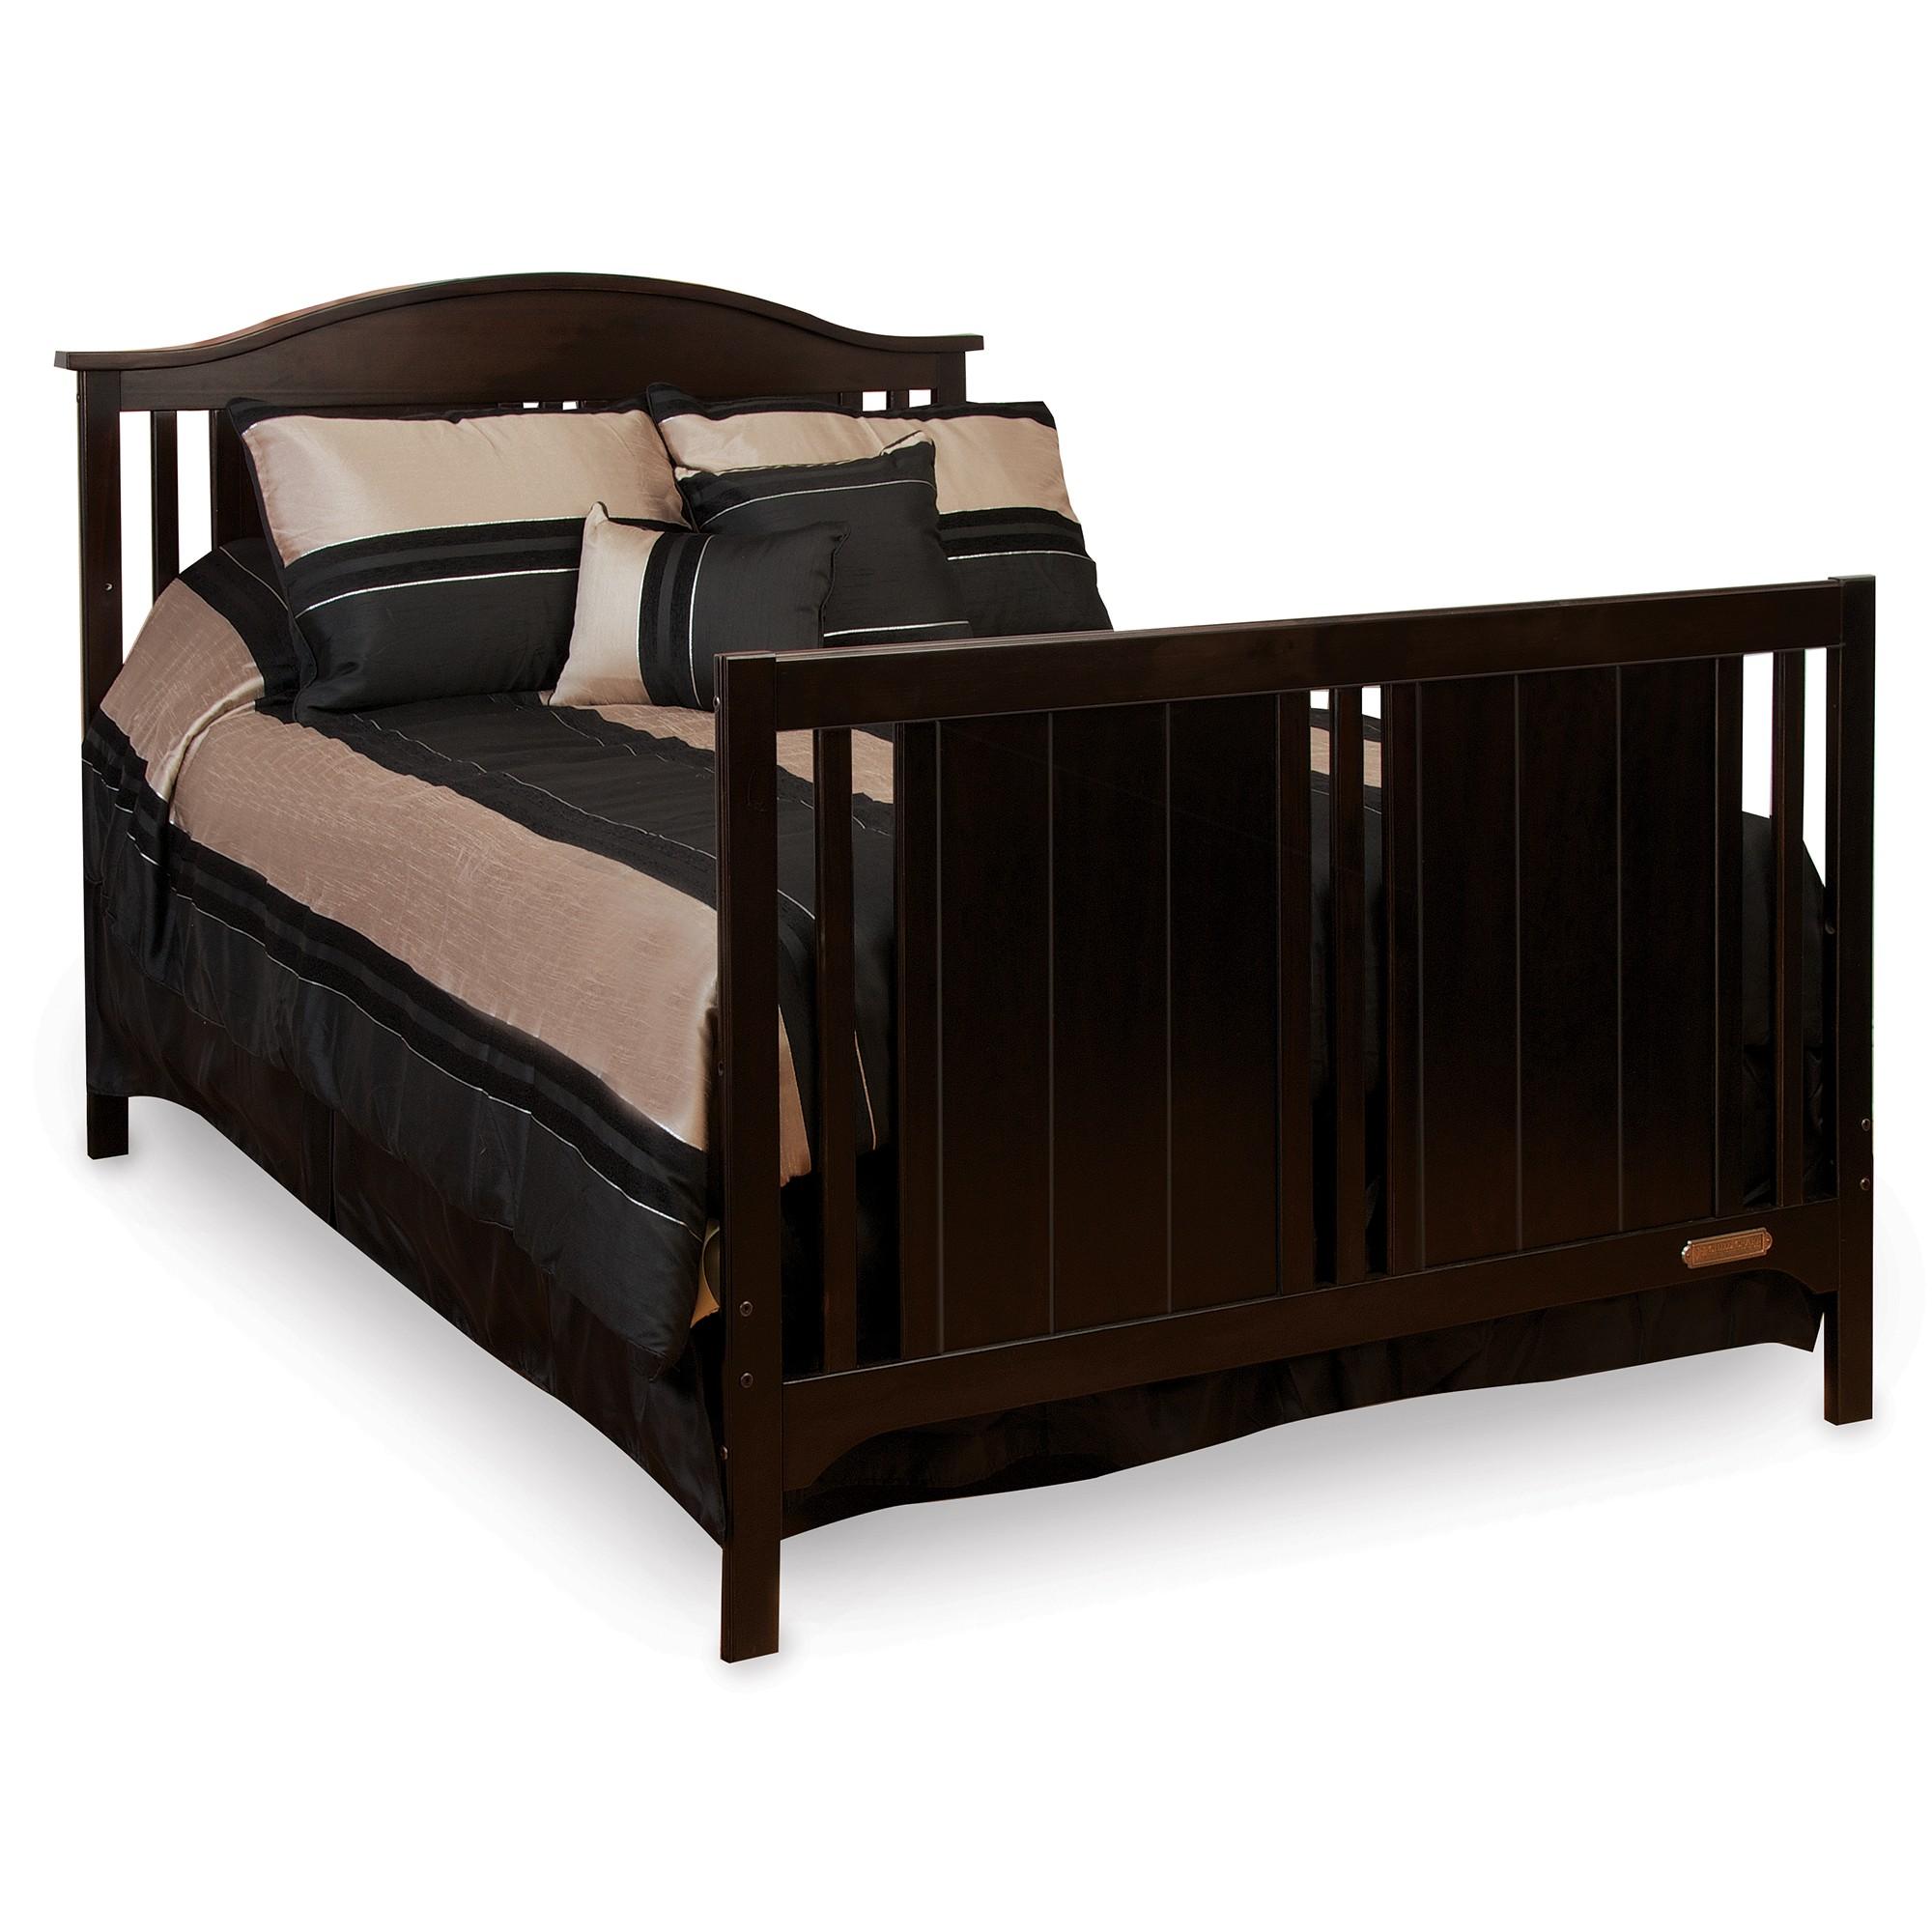 Child craft coventry crib -  Watterson Convertible Child Craft Crib Full Bed